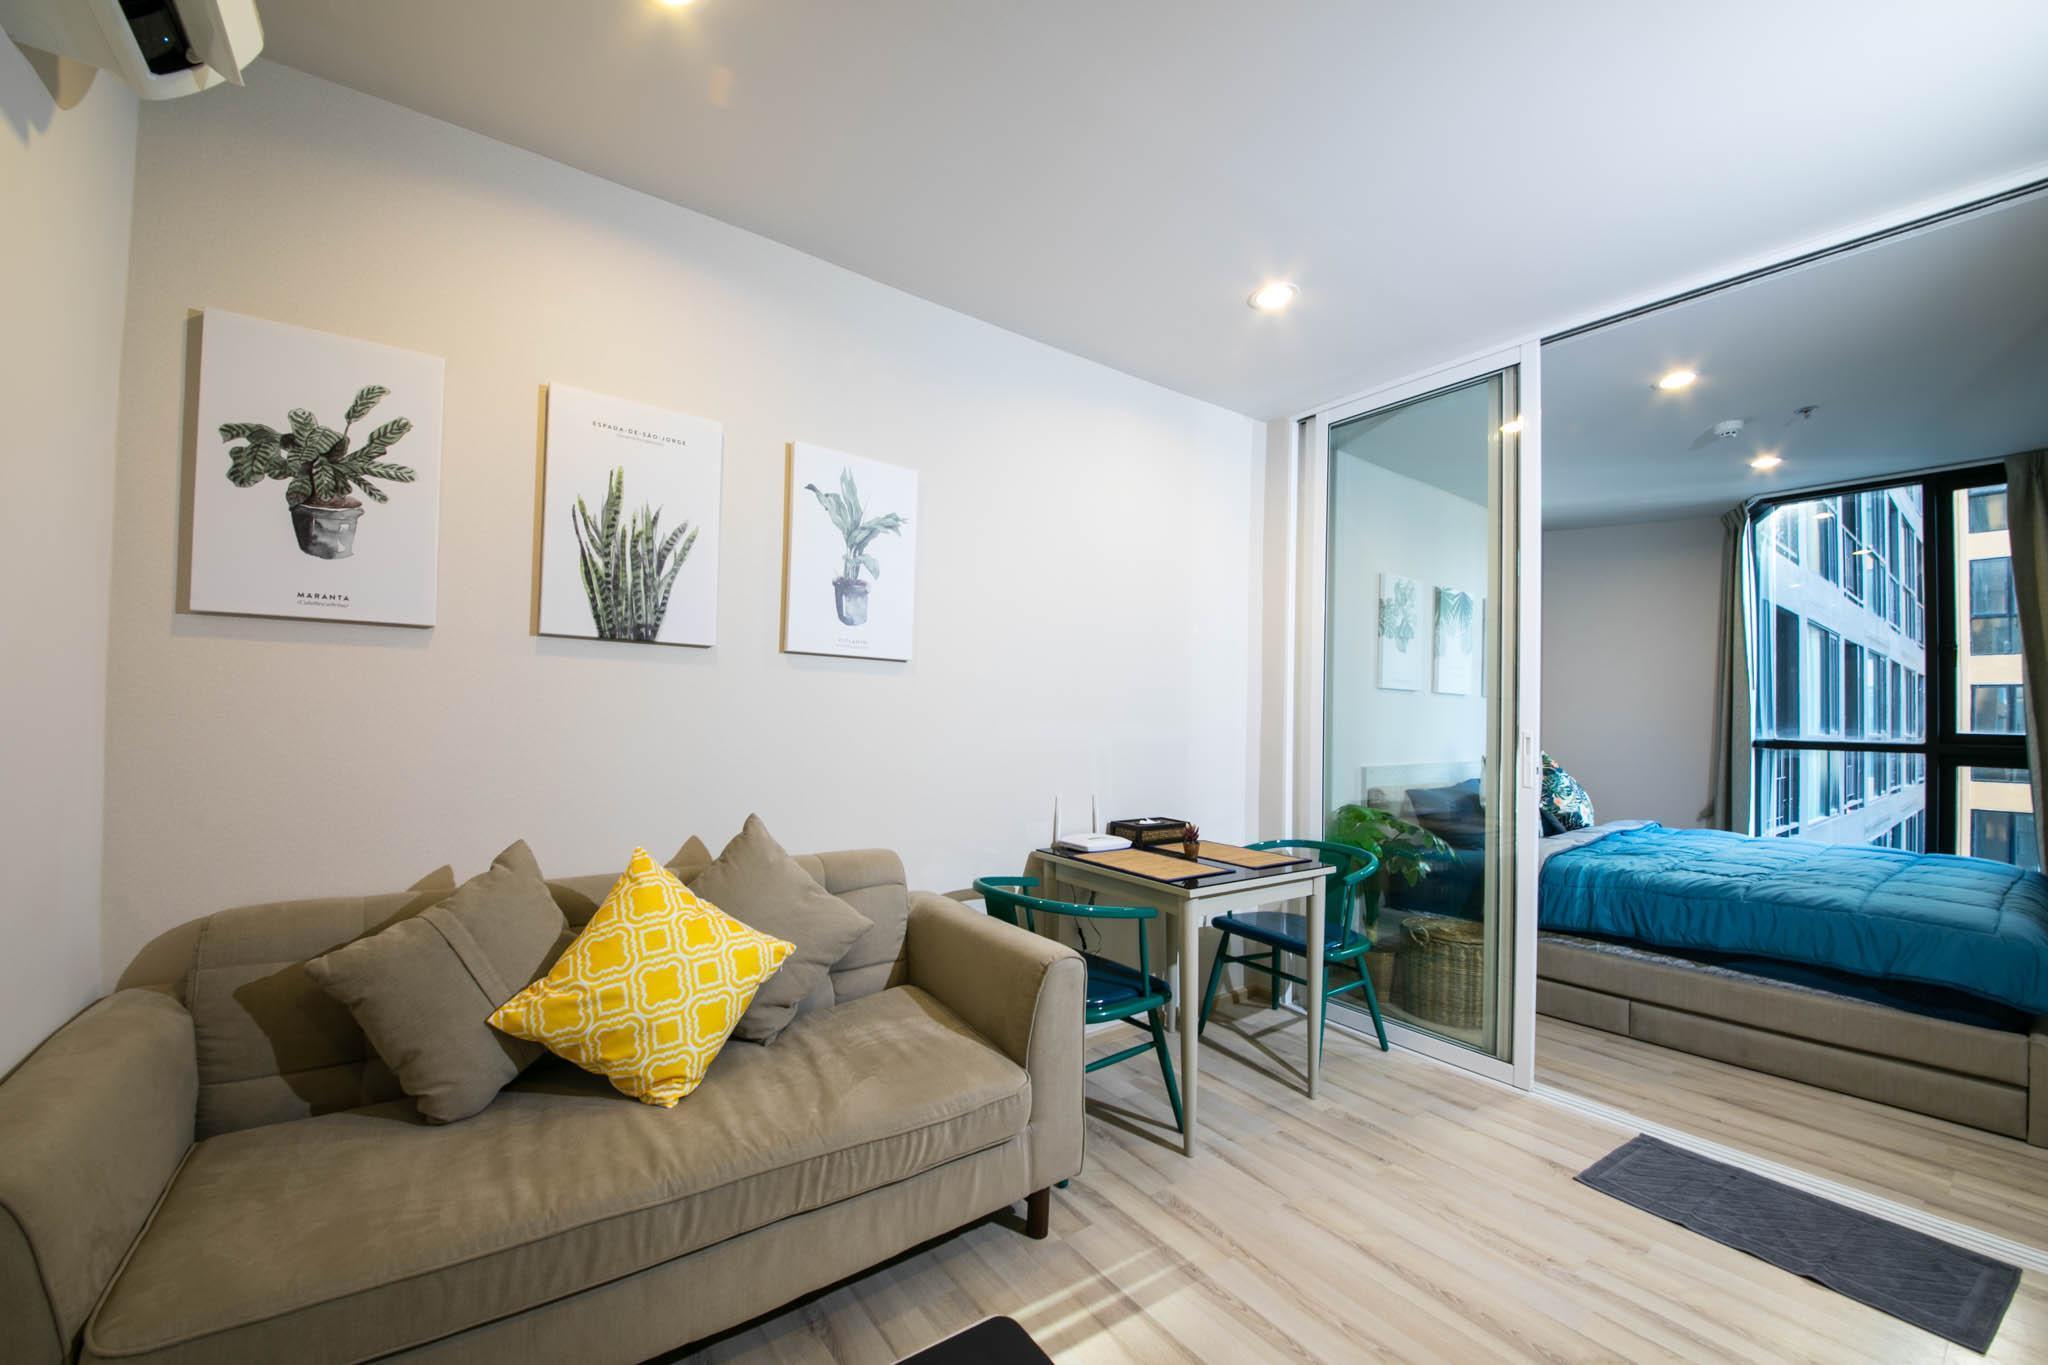 Luxury&RooftopPoolFastWifi FreeWater&Elec NearTown